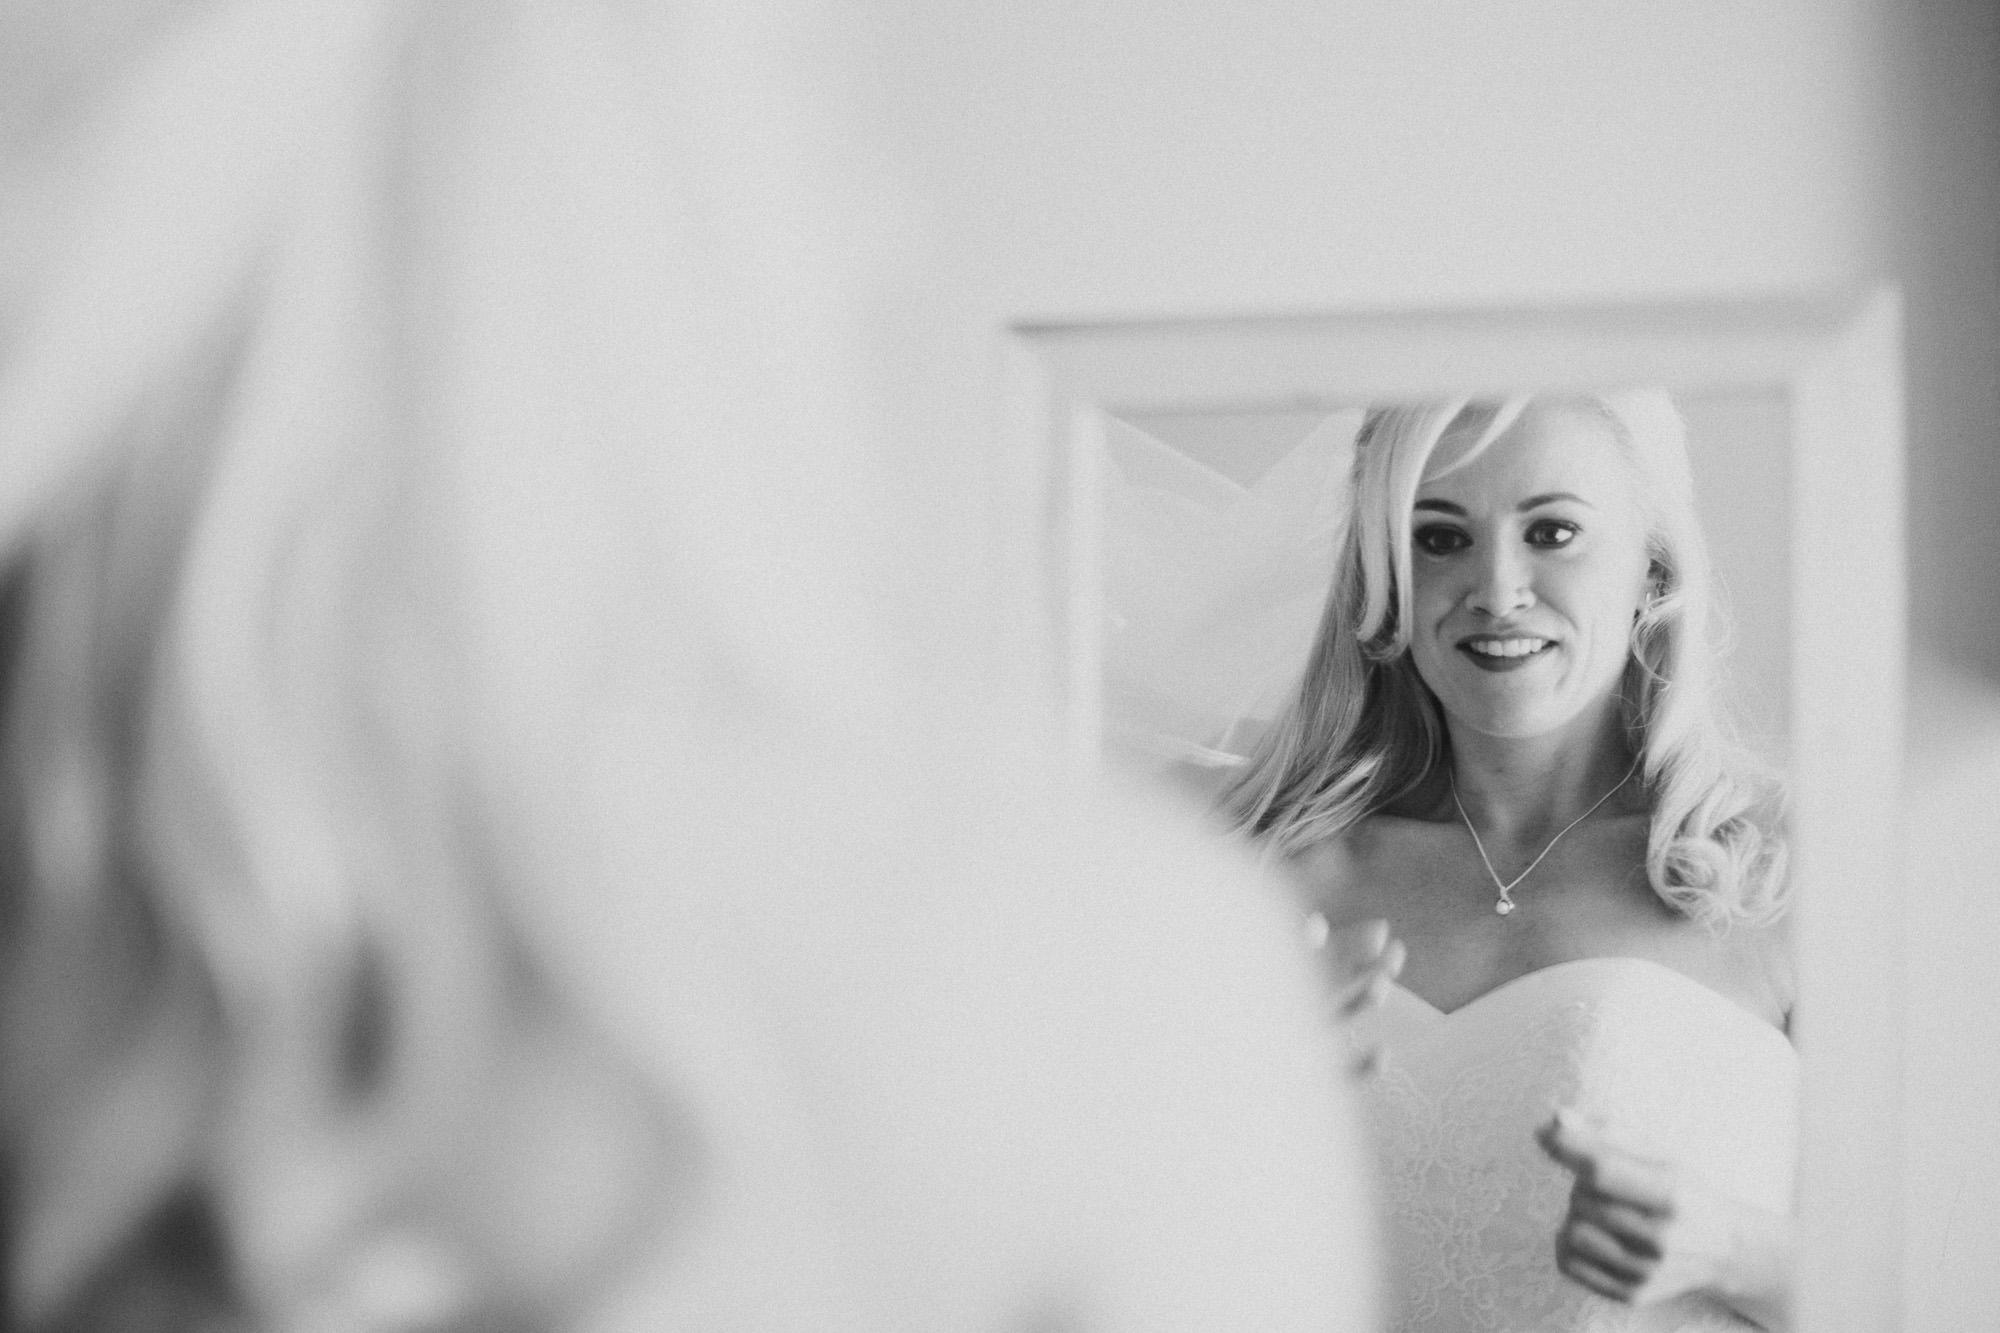 CLAIREBYRNEPHOTOGRAPHY-WEDDING-Ireland-tulffaris-alternative-fun-Lisa-terry-1.jpg